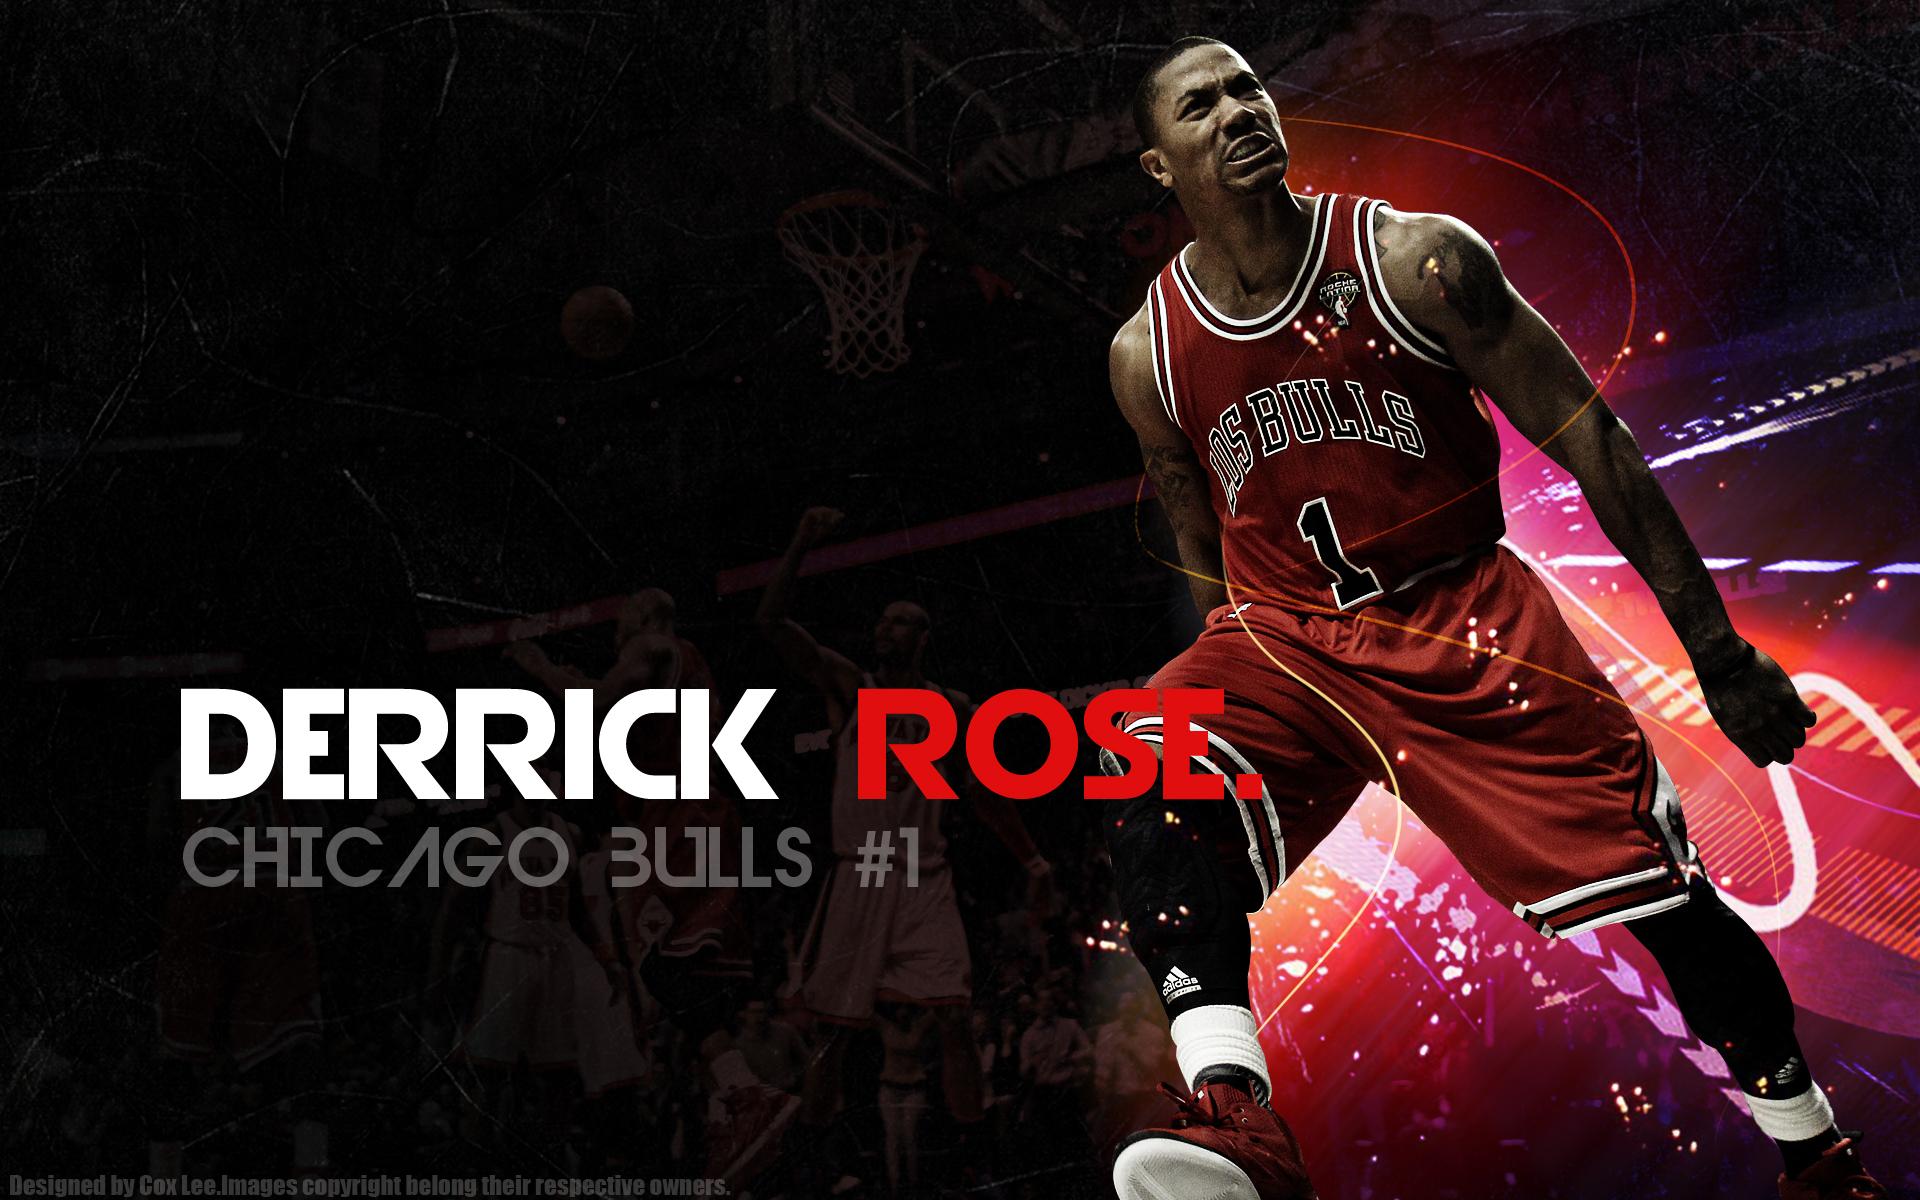 Derrick Rose by coxlee 1920 x 1200 1920x1200